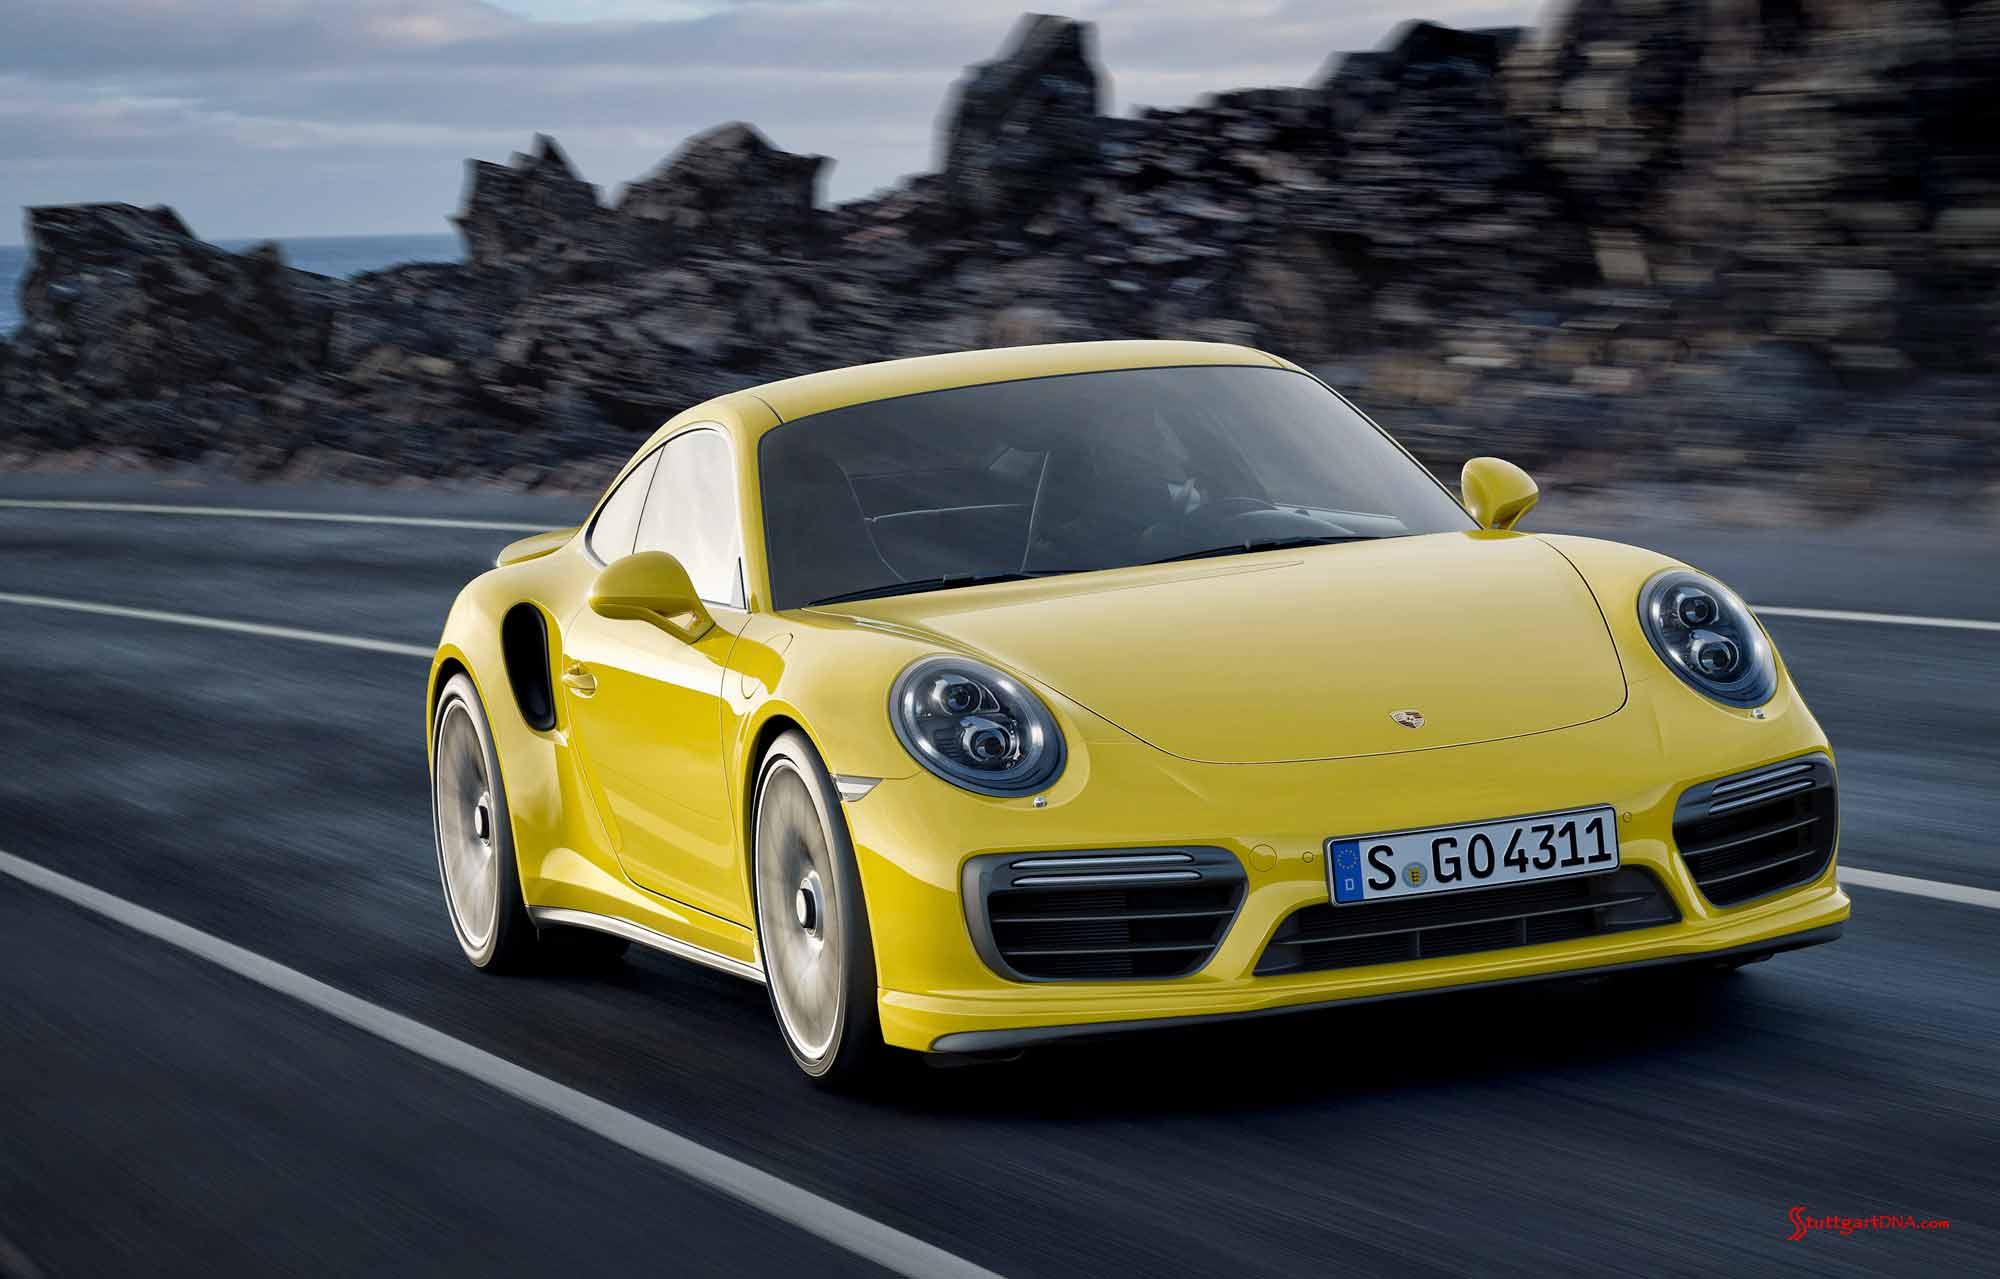 Yellow-2017-991-2-Turbo-coupe-on-rocky-road Mesmerizing Porsche 918 Spyder London Ontario Cars Trend